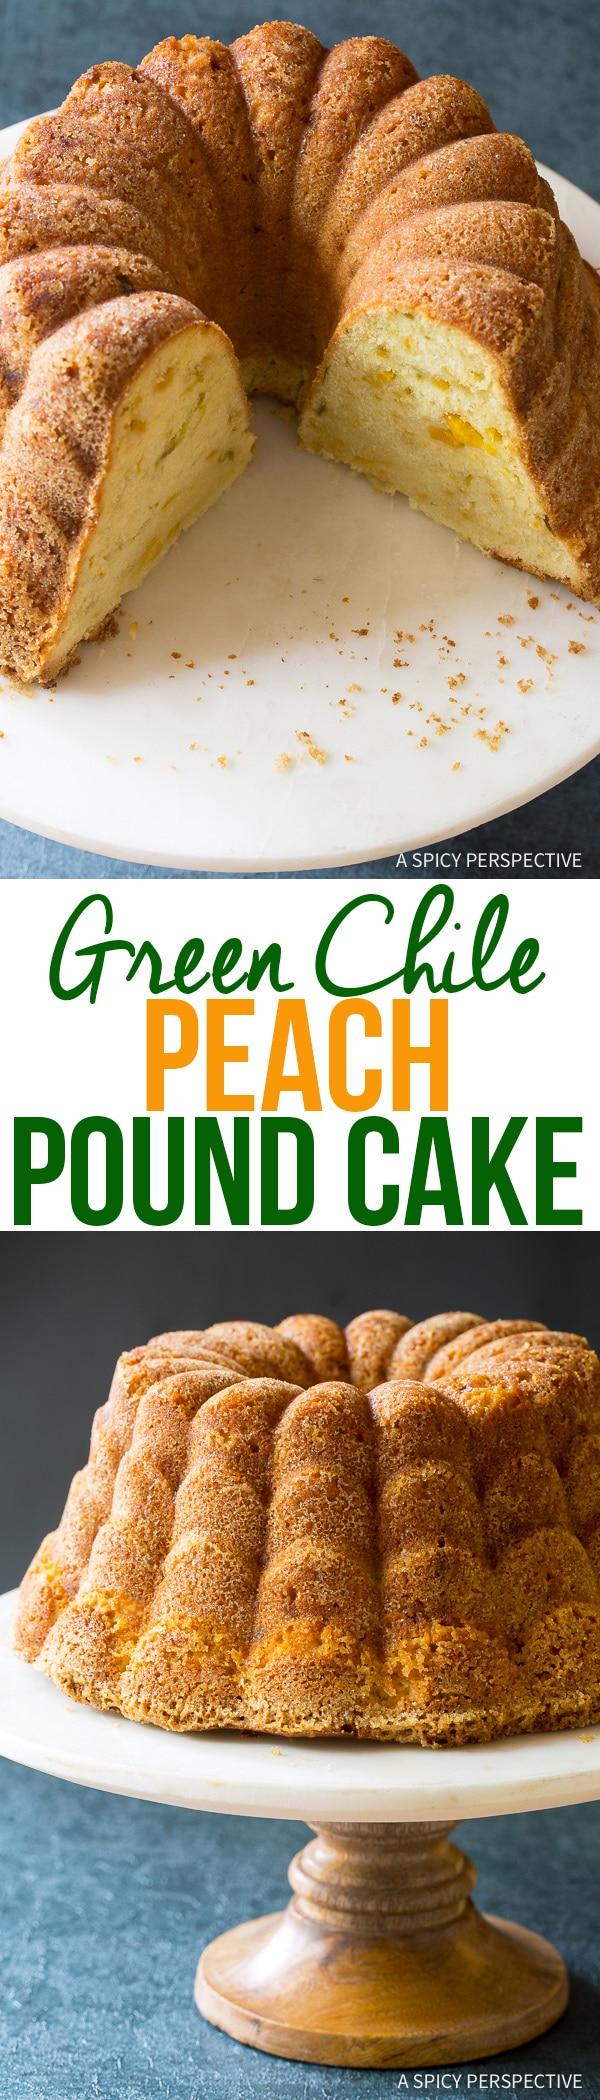 Spicy Sweet Green Chile Peach Pound Cake Recipe